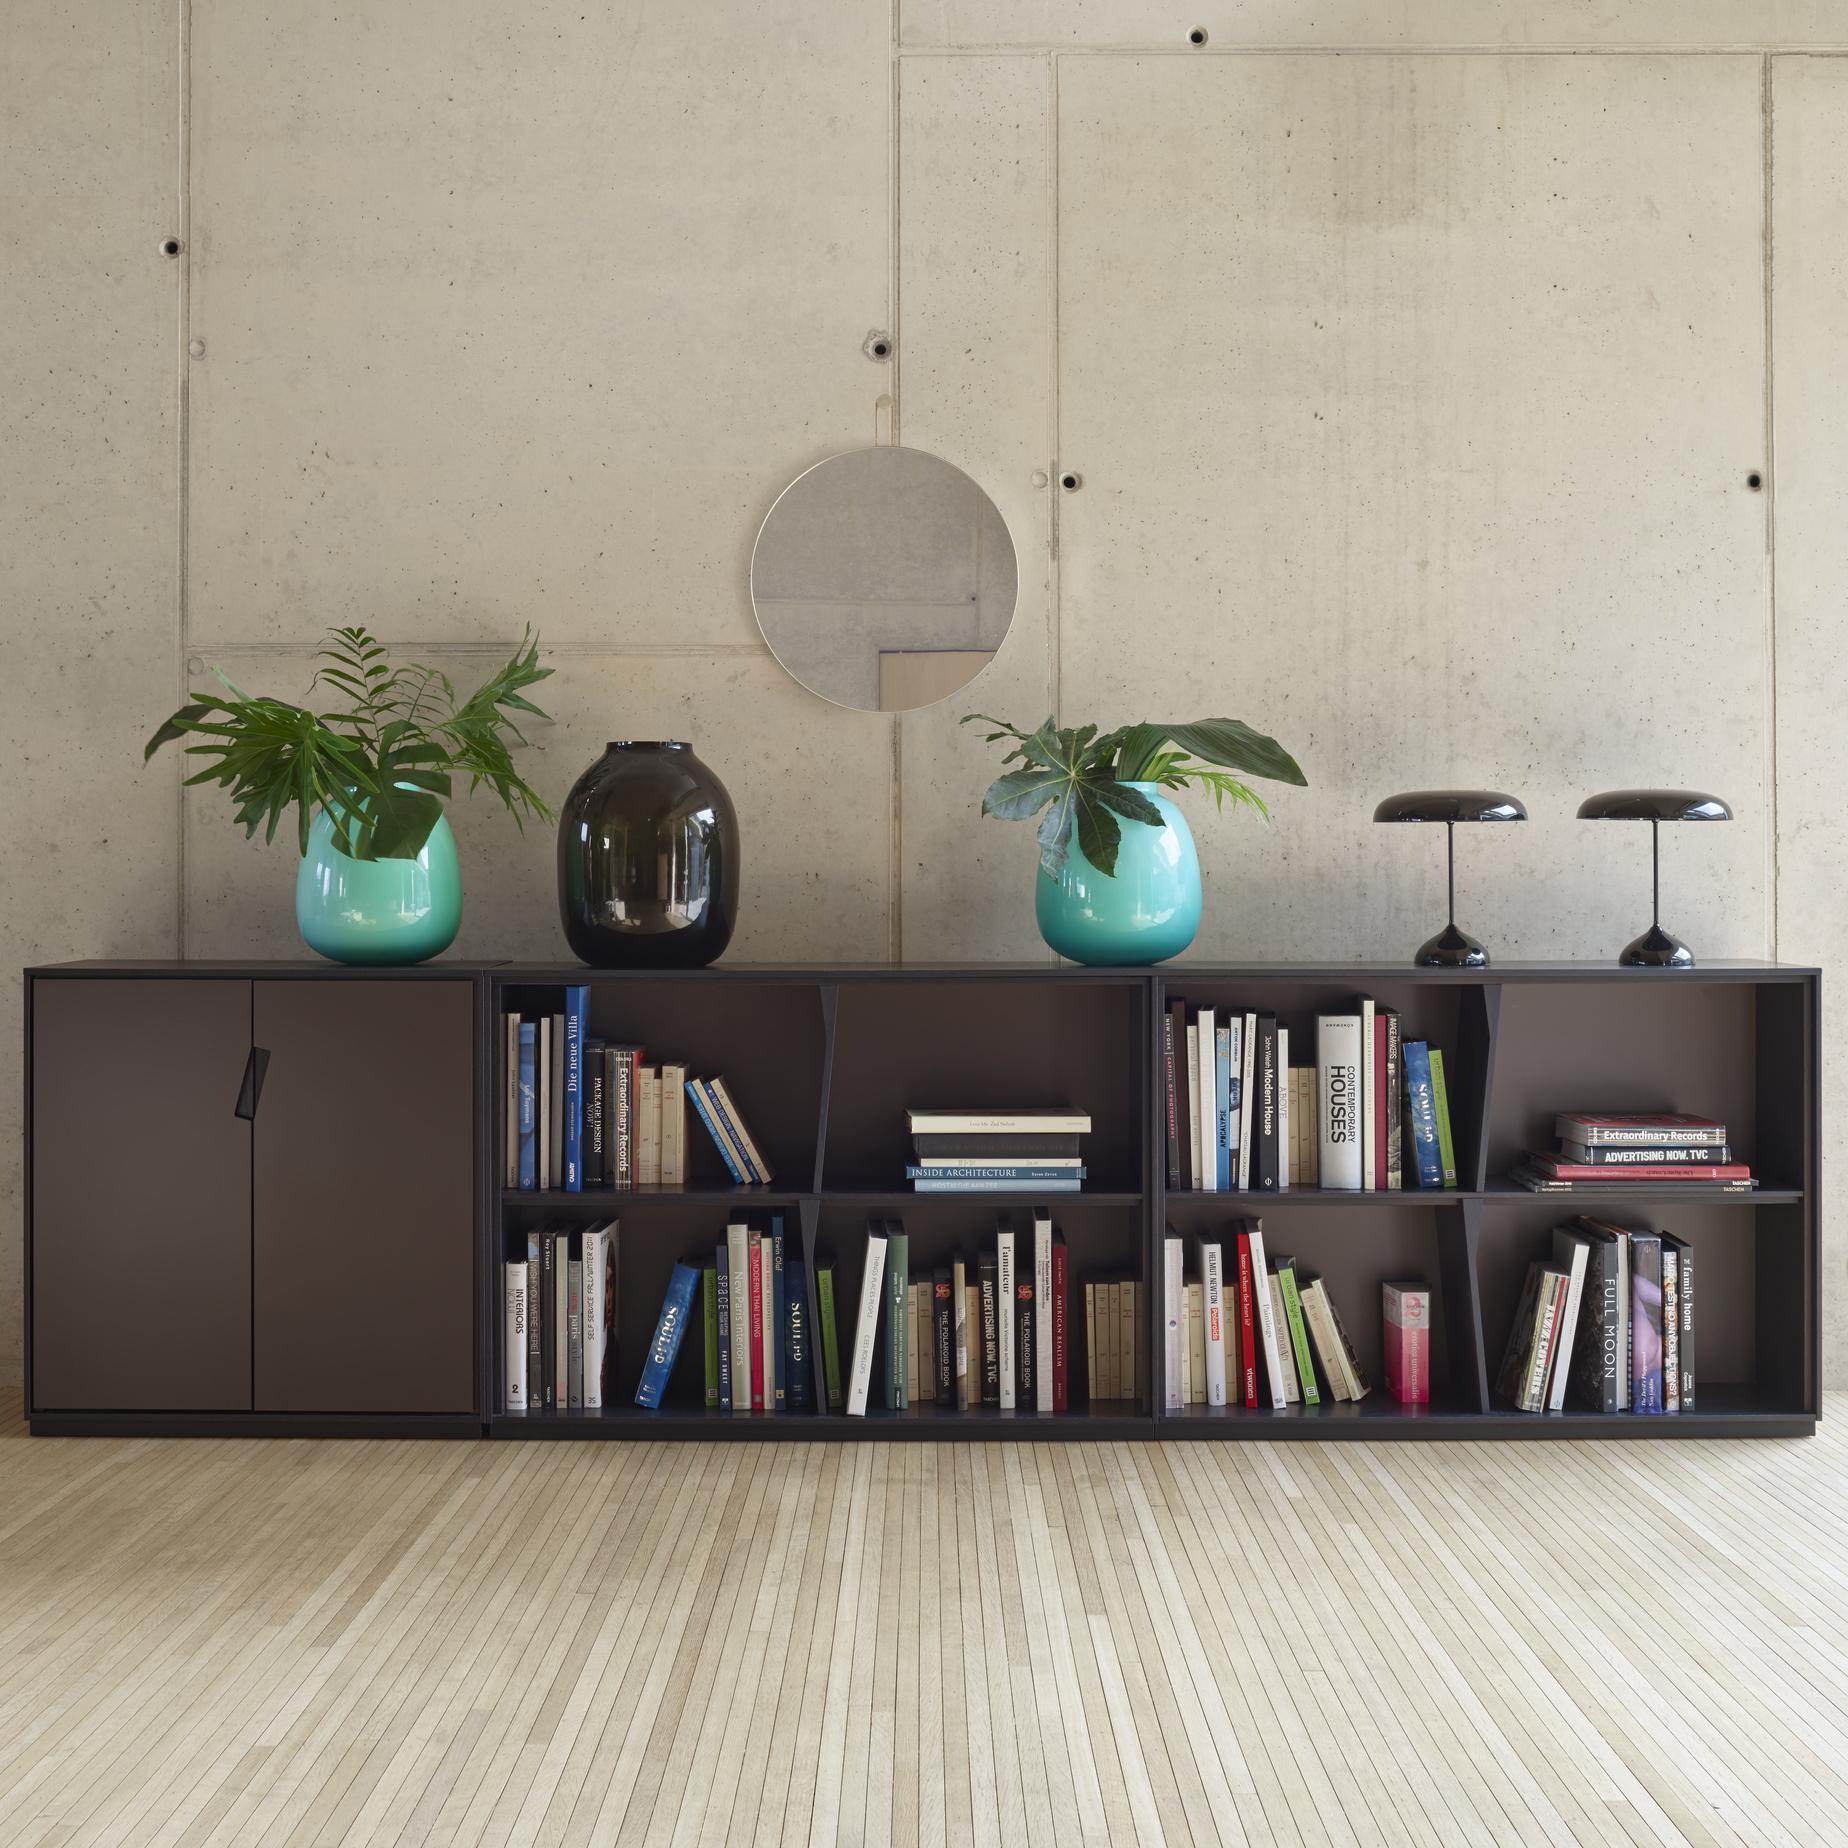 Lapa Dressers Designer Fran Ois Bauchet Ligne Roset # Muebles Gomez Y Sierra